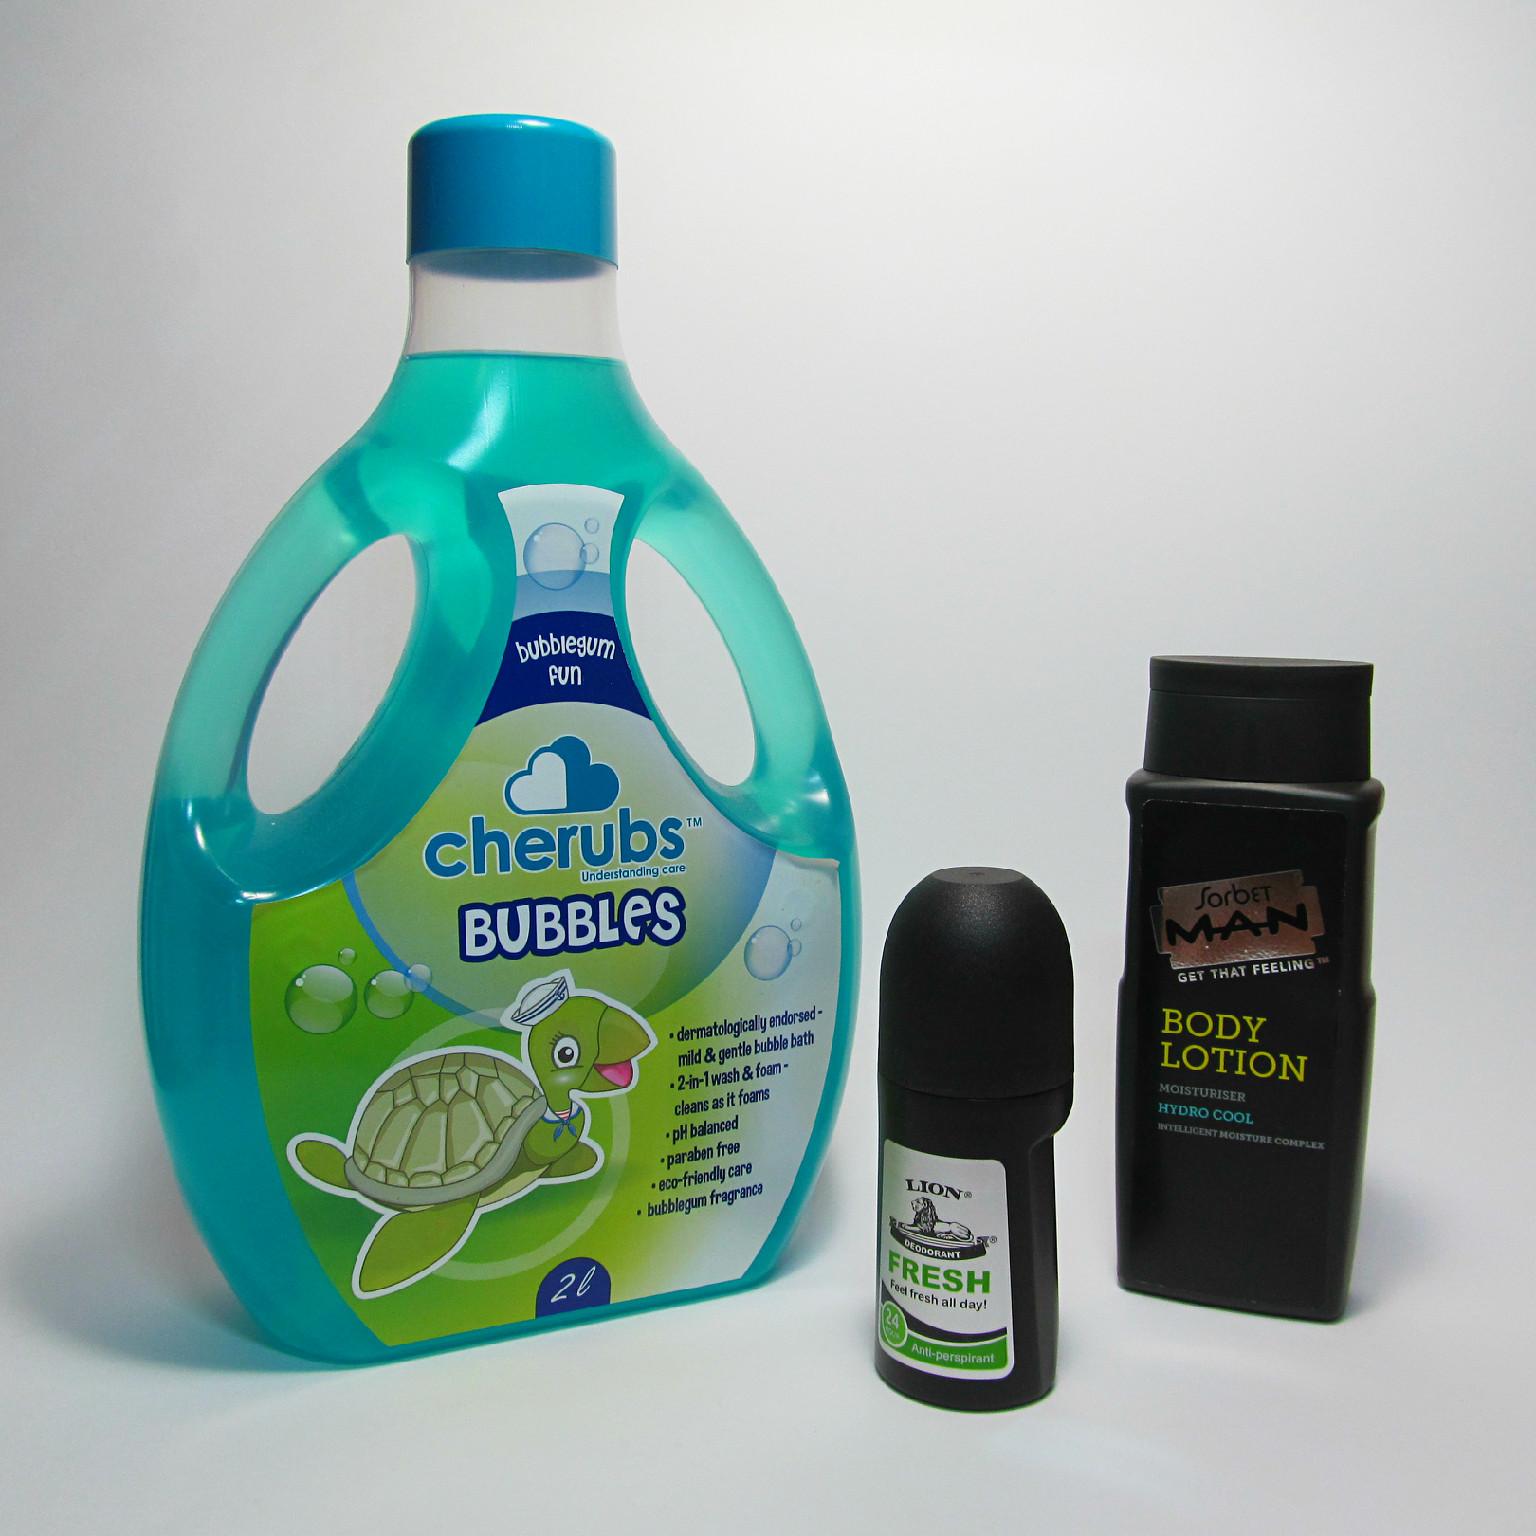 Branded orientated bottles.